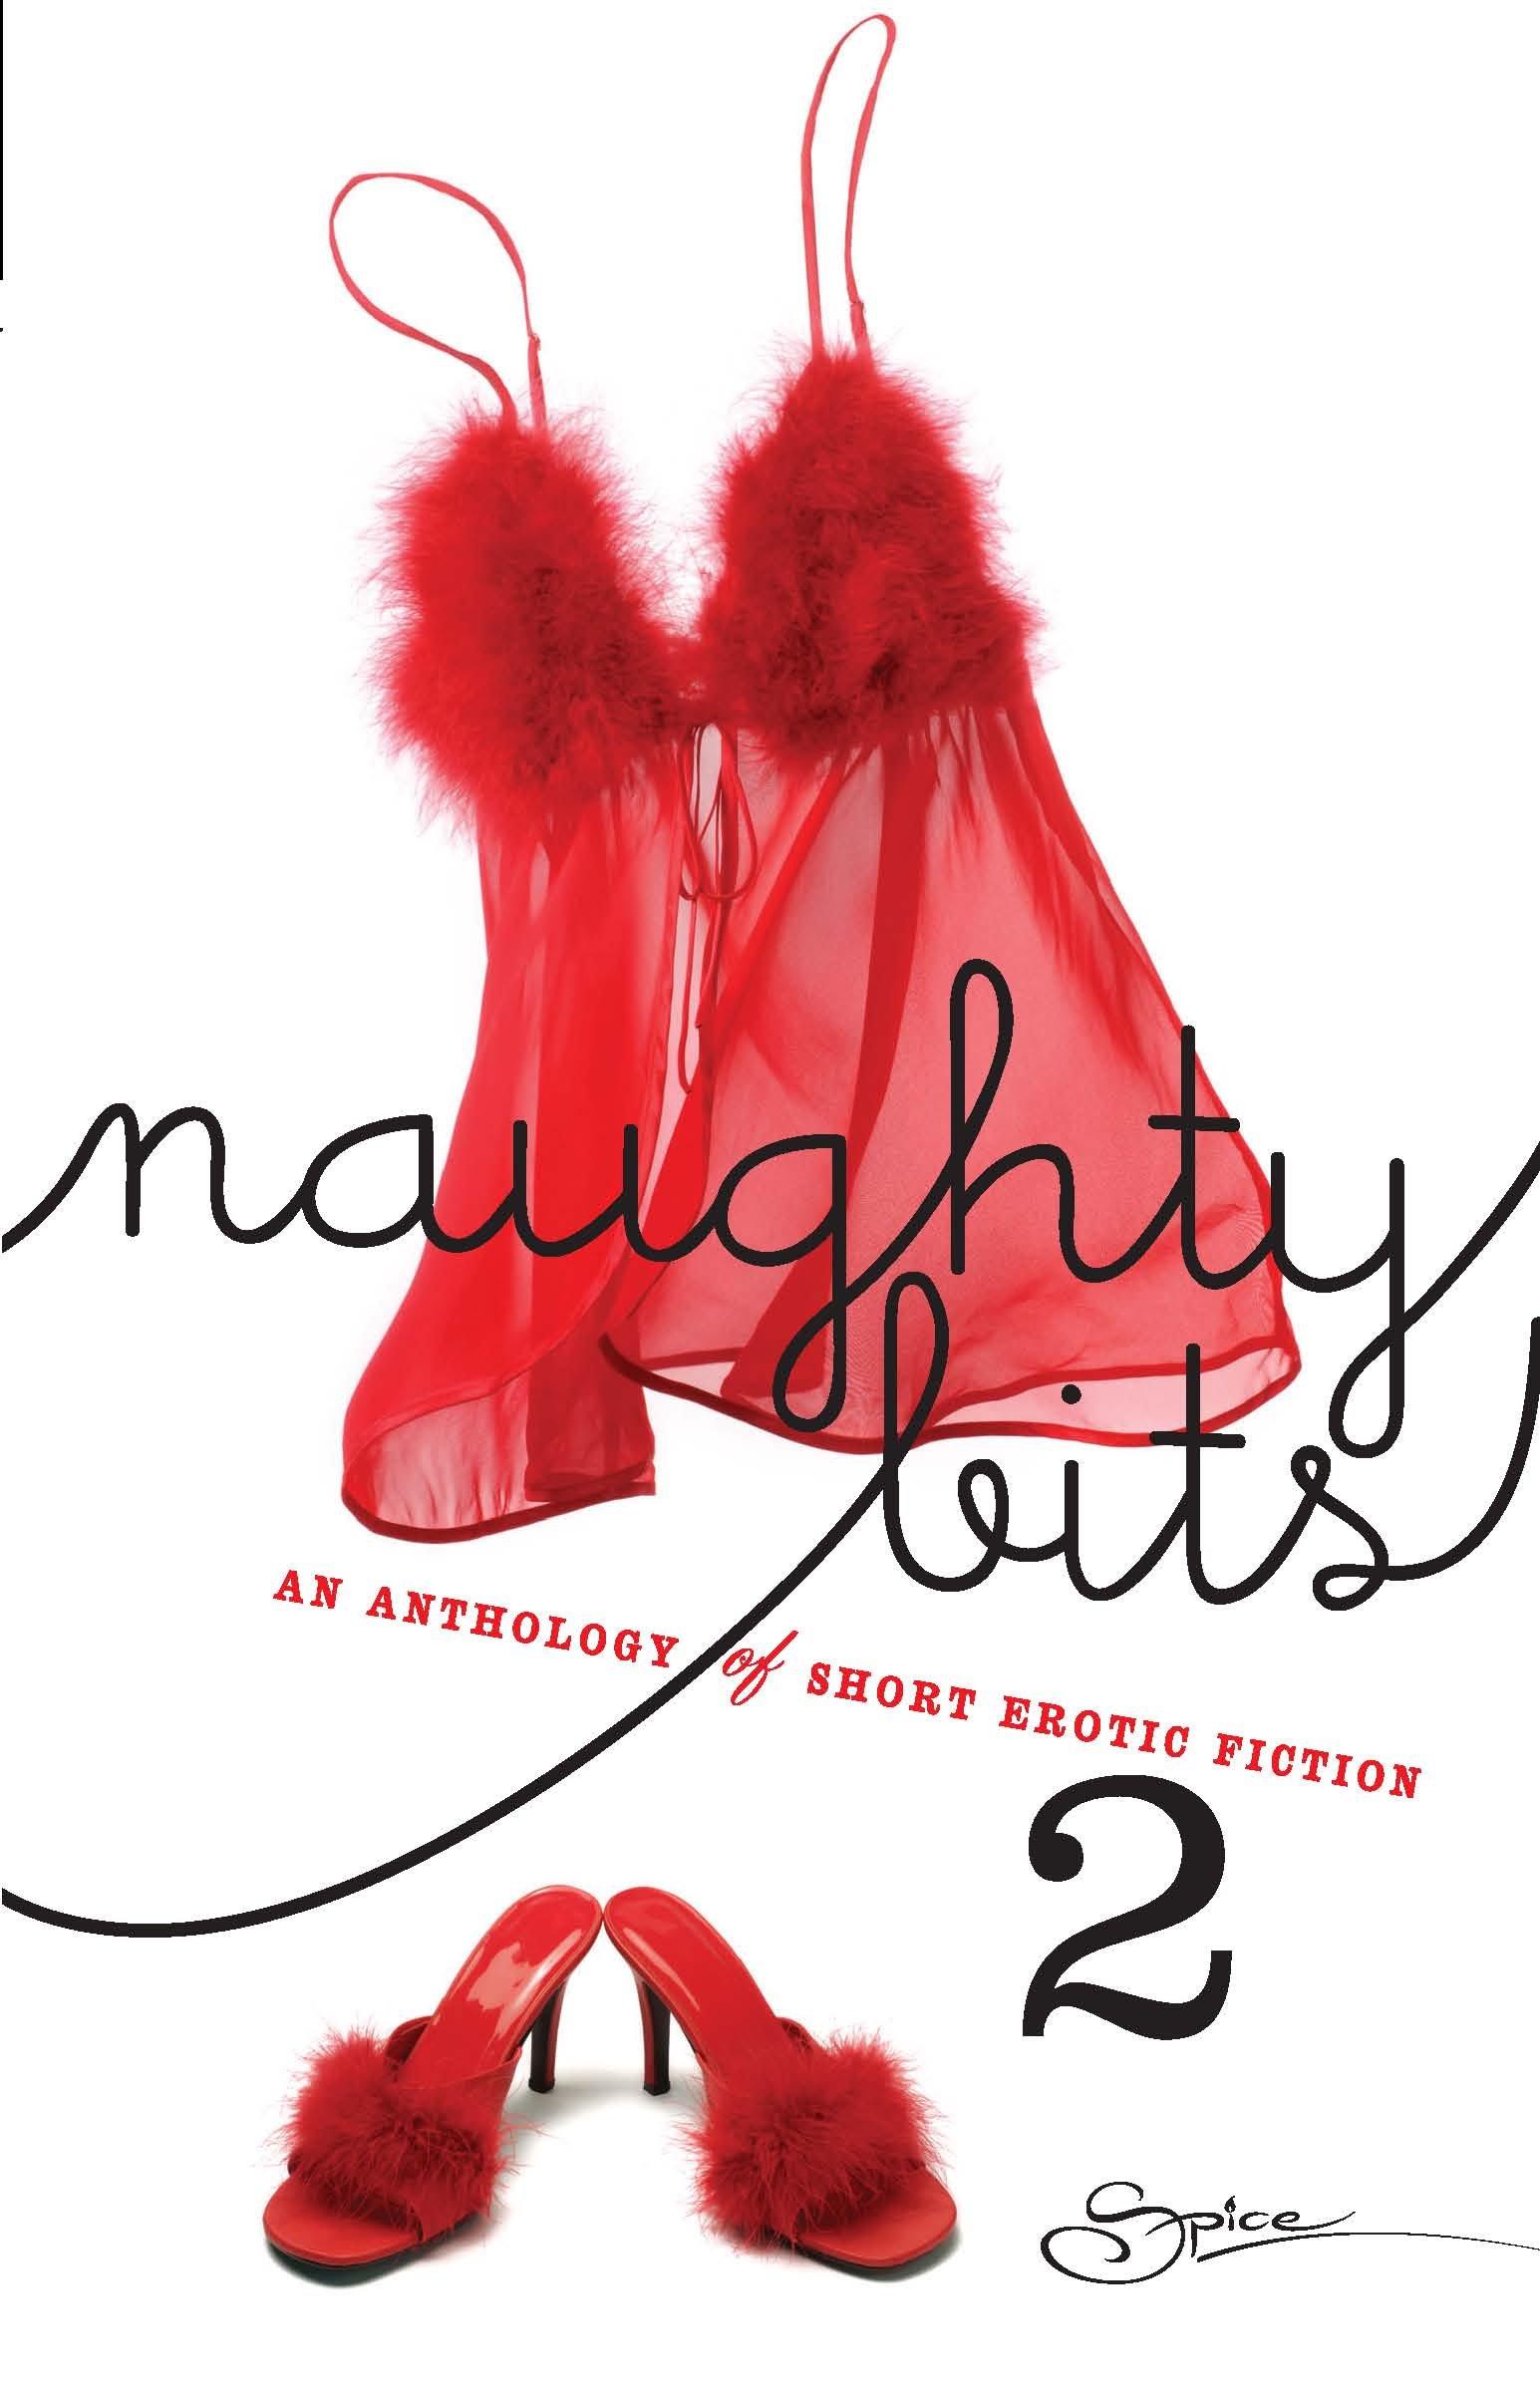 Mature naughty outside 2